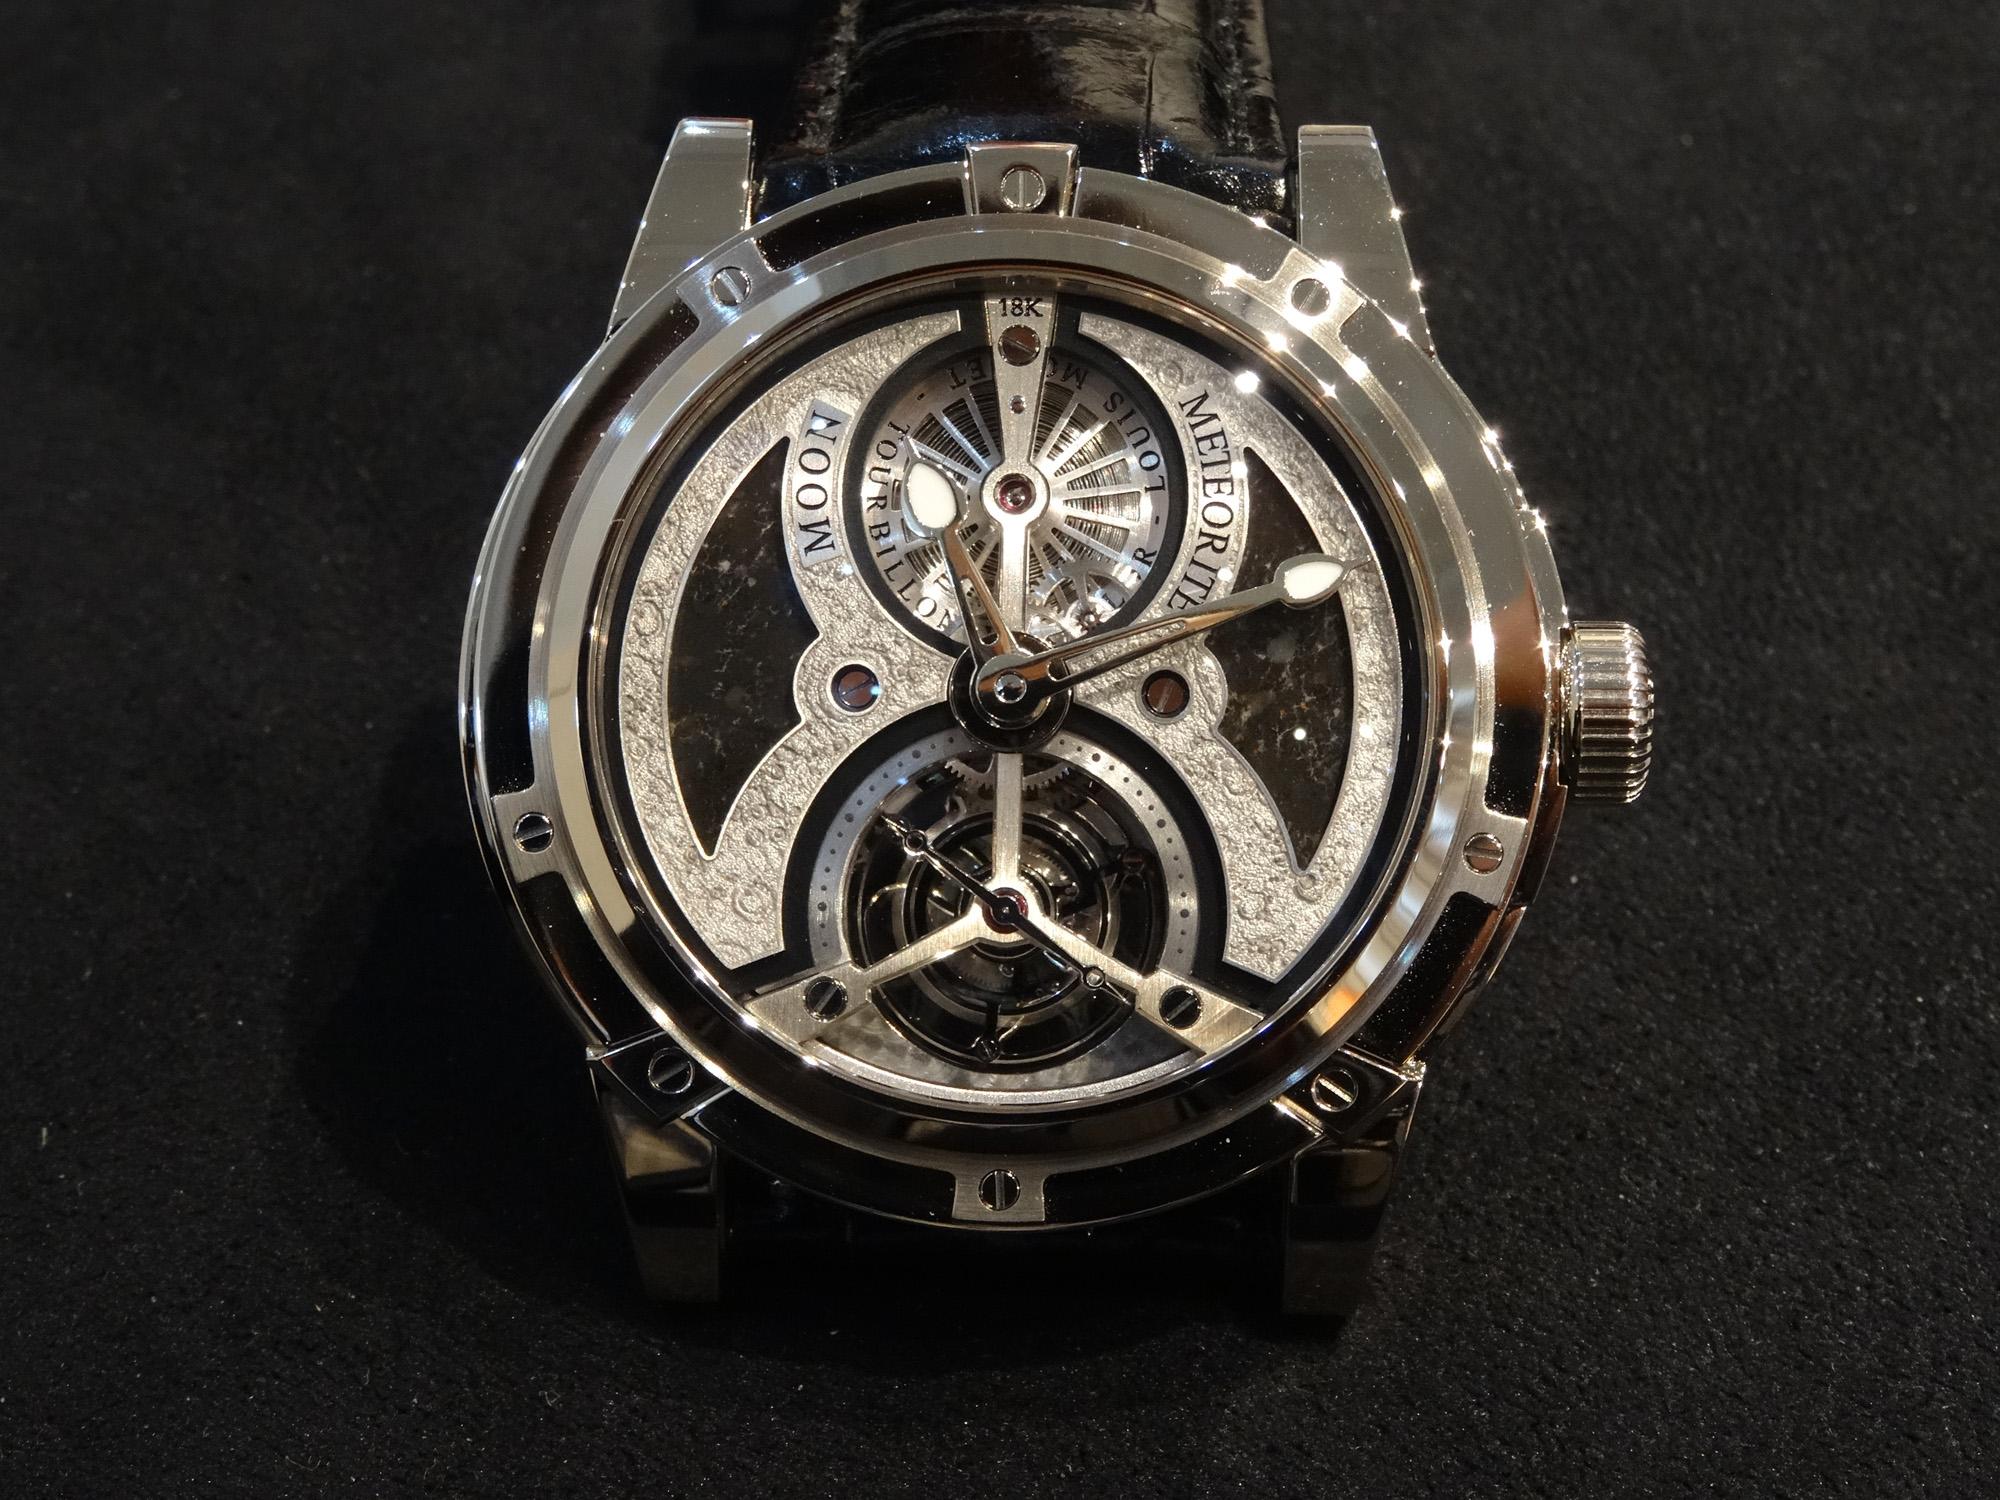 Louis Moinet Astrolabe Tourbillon - Moon Meteorite Edition